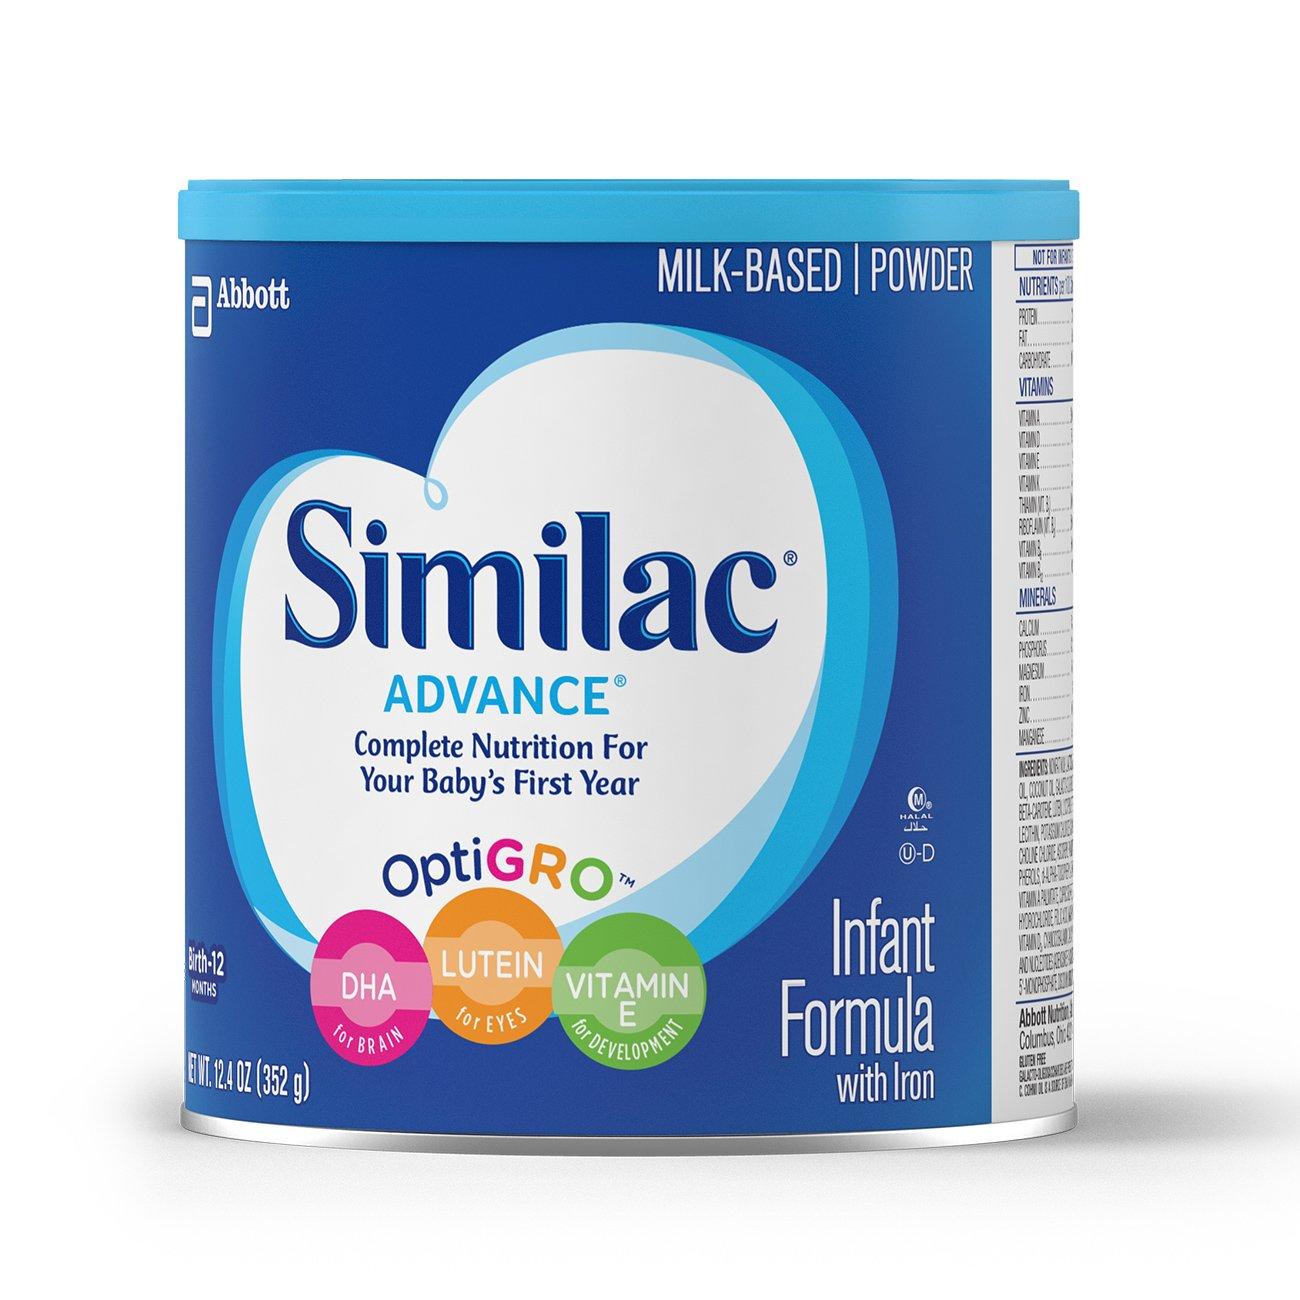 Similac Advance Infant Formula with Iron, Baby Formula, Powder, 12.4 oz (Pack of 6) by Similac (Image #10)